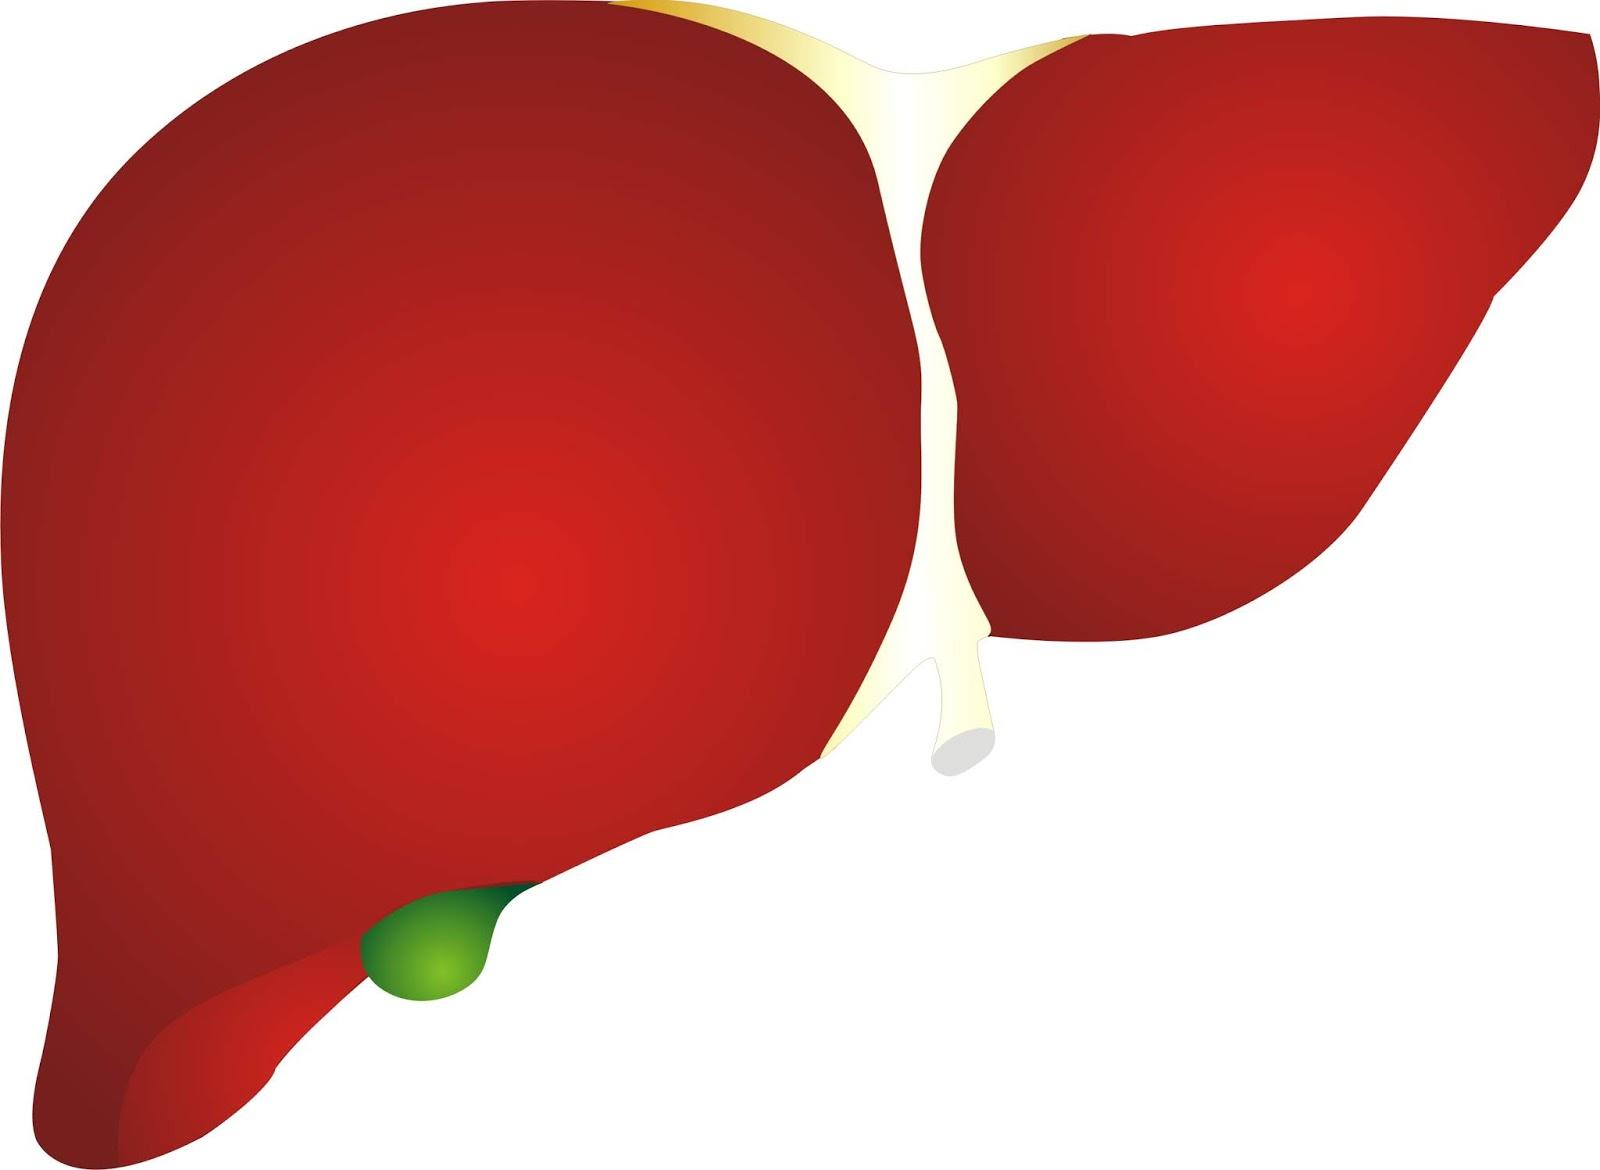 LIVER PNG, LIVER IMAGES, Liver icon symbol 3D style Trendy.